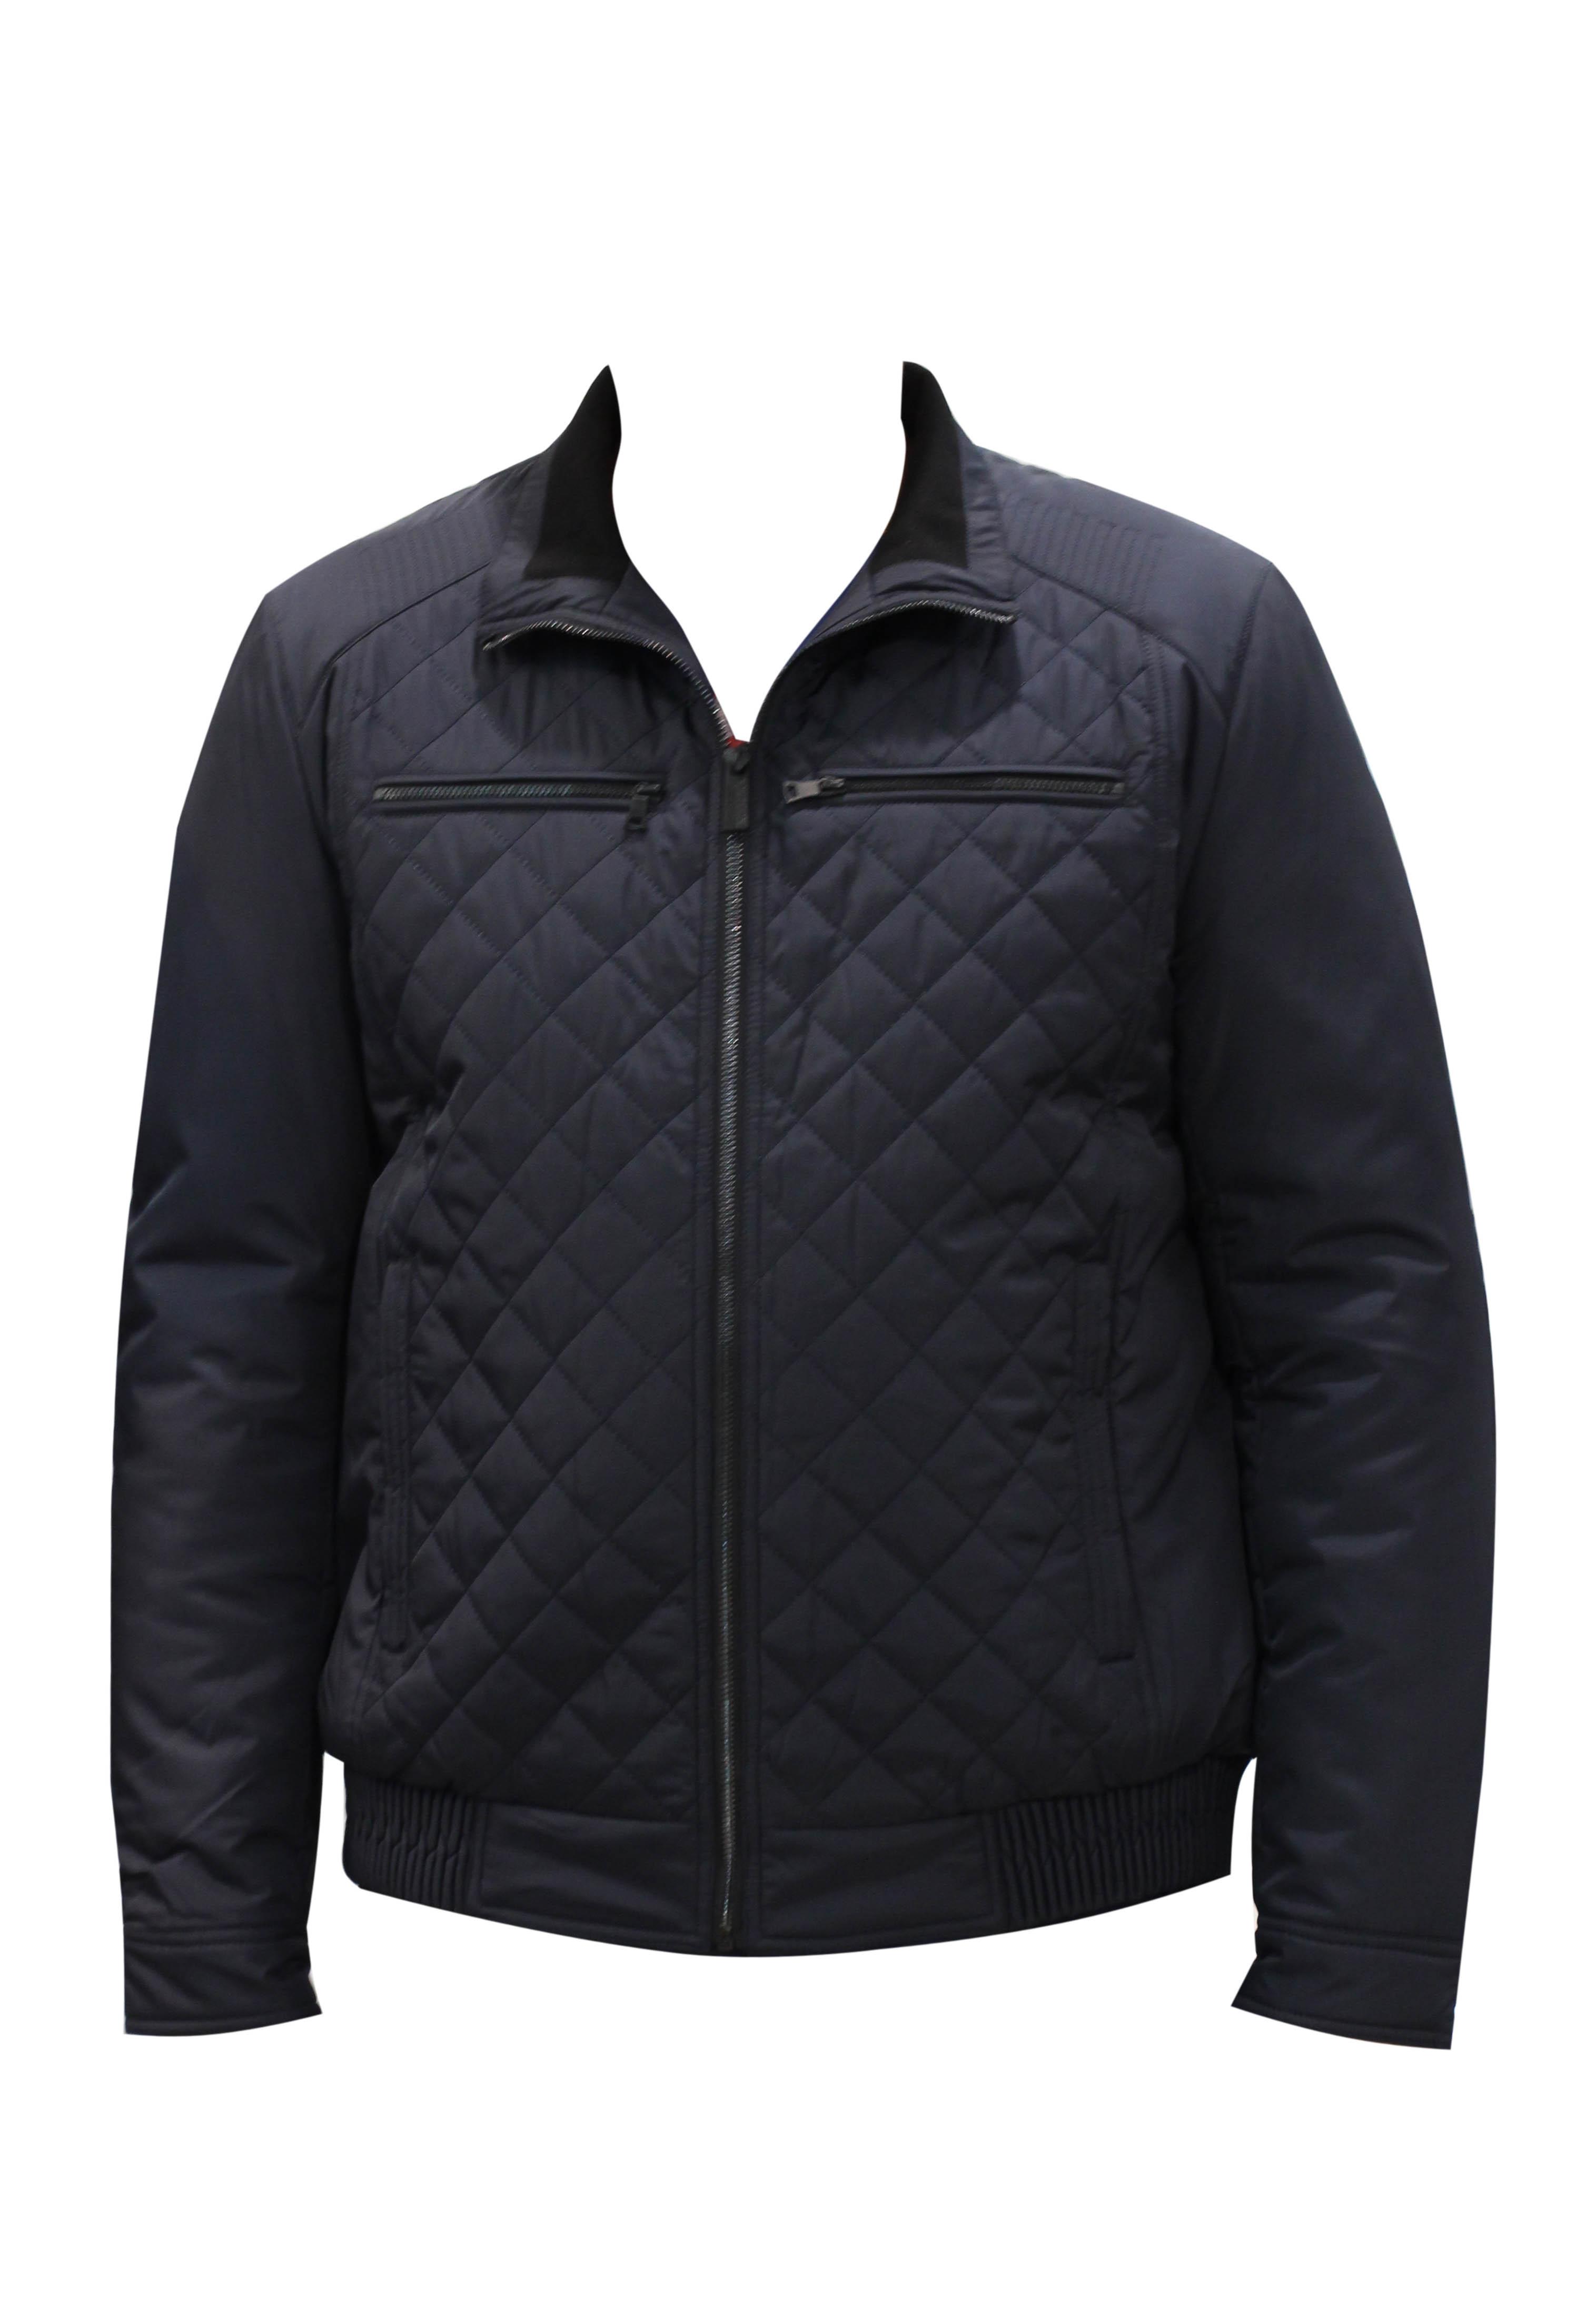 Демисезонная куртка Санкт-Петербург BriksTon glazzex